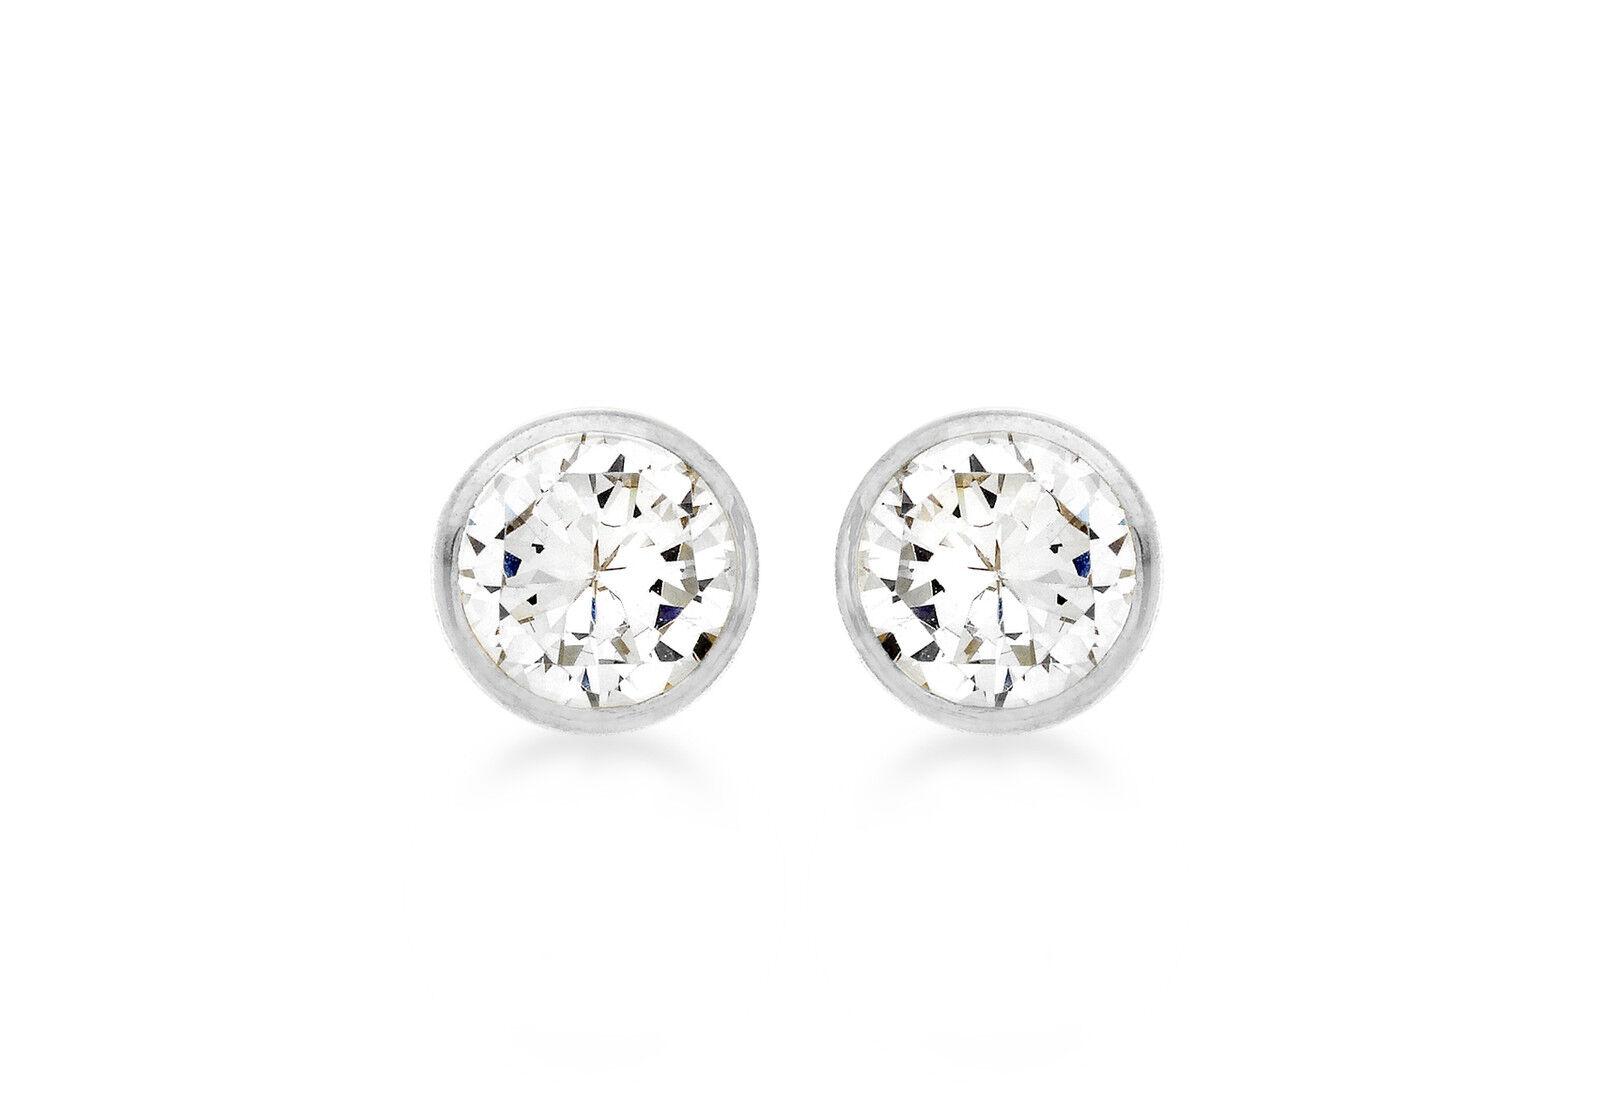 9ct White gold 5mm Round CZ Stud Earrings Inc Luxury Gift Box Jewellery